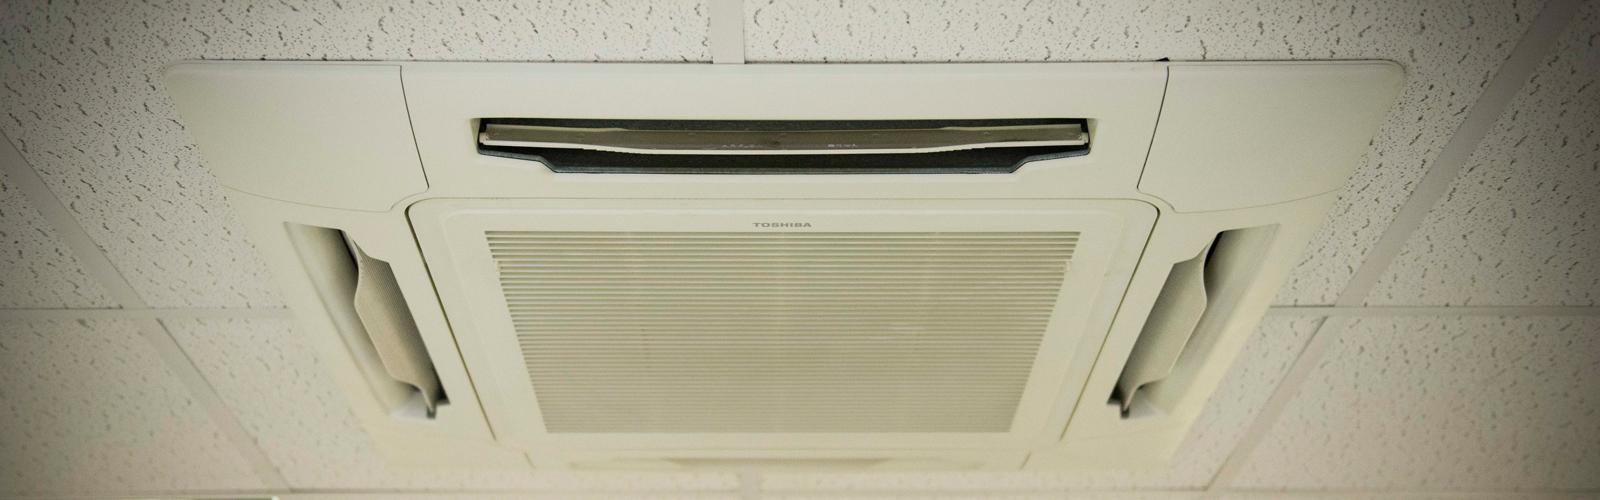 Indoor Air Conditioning